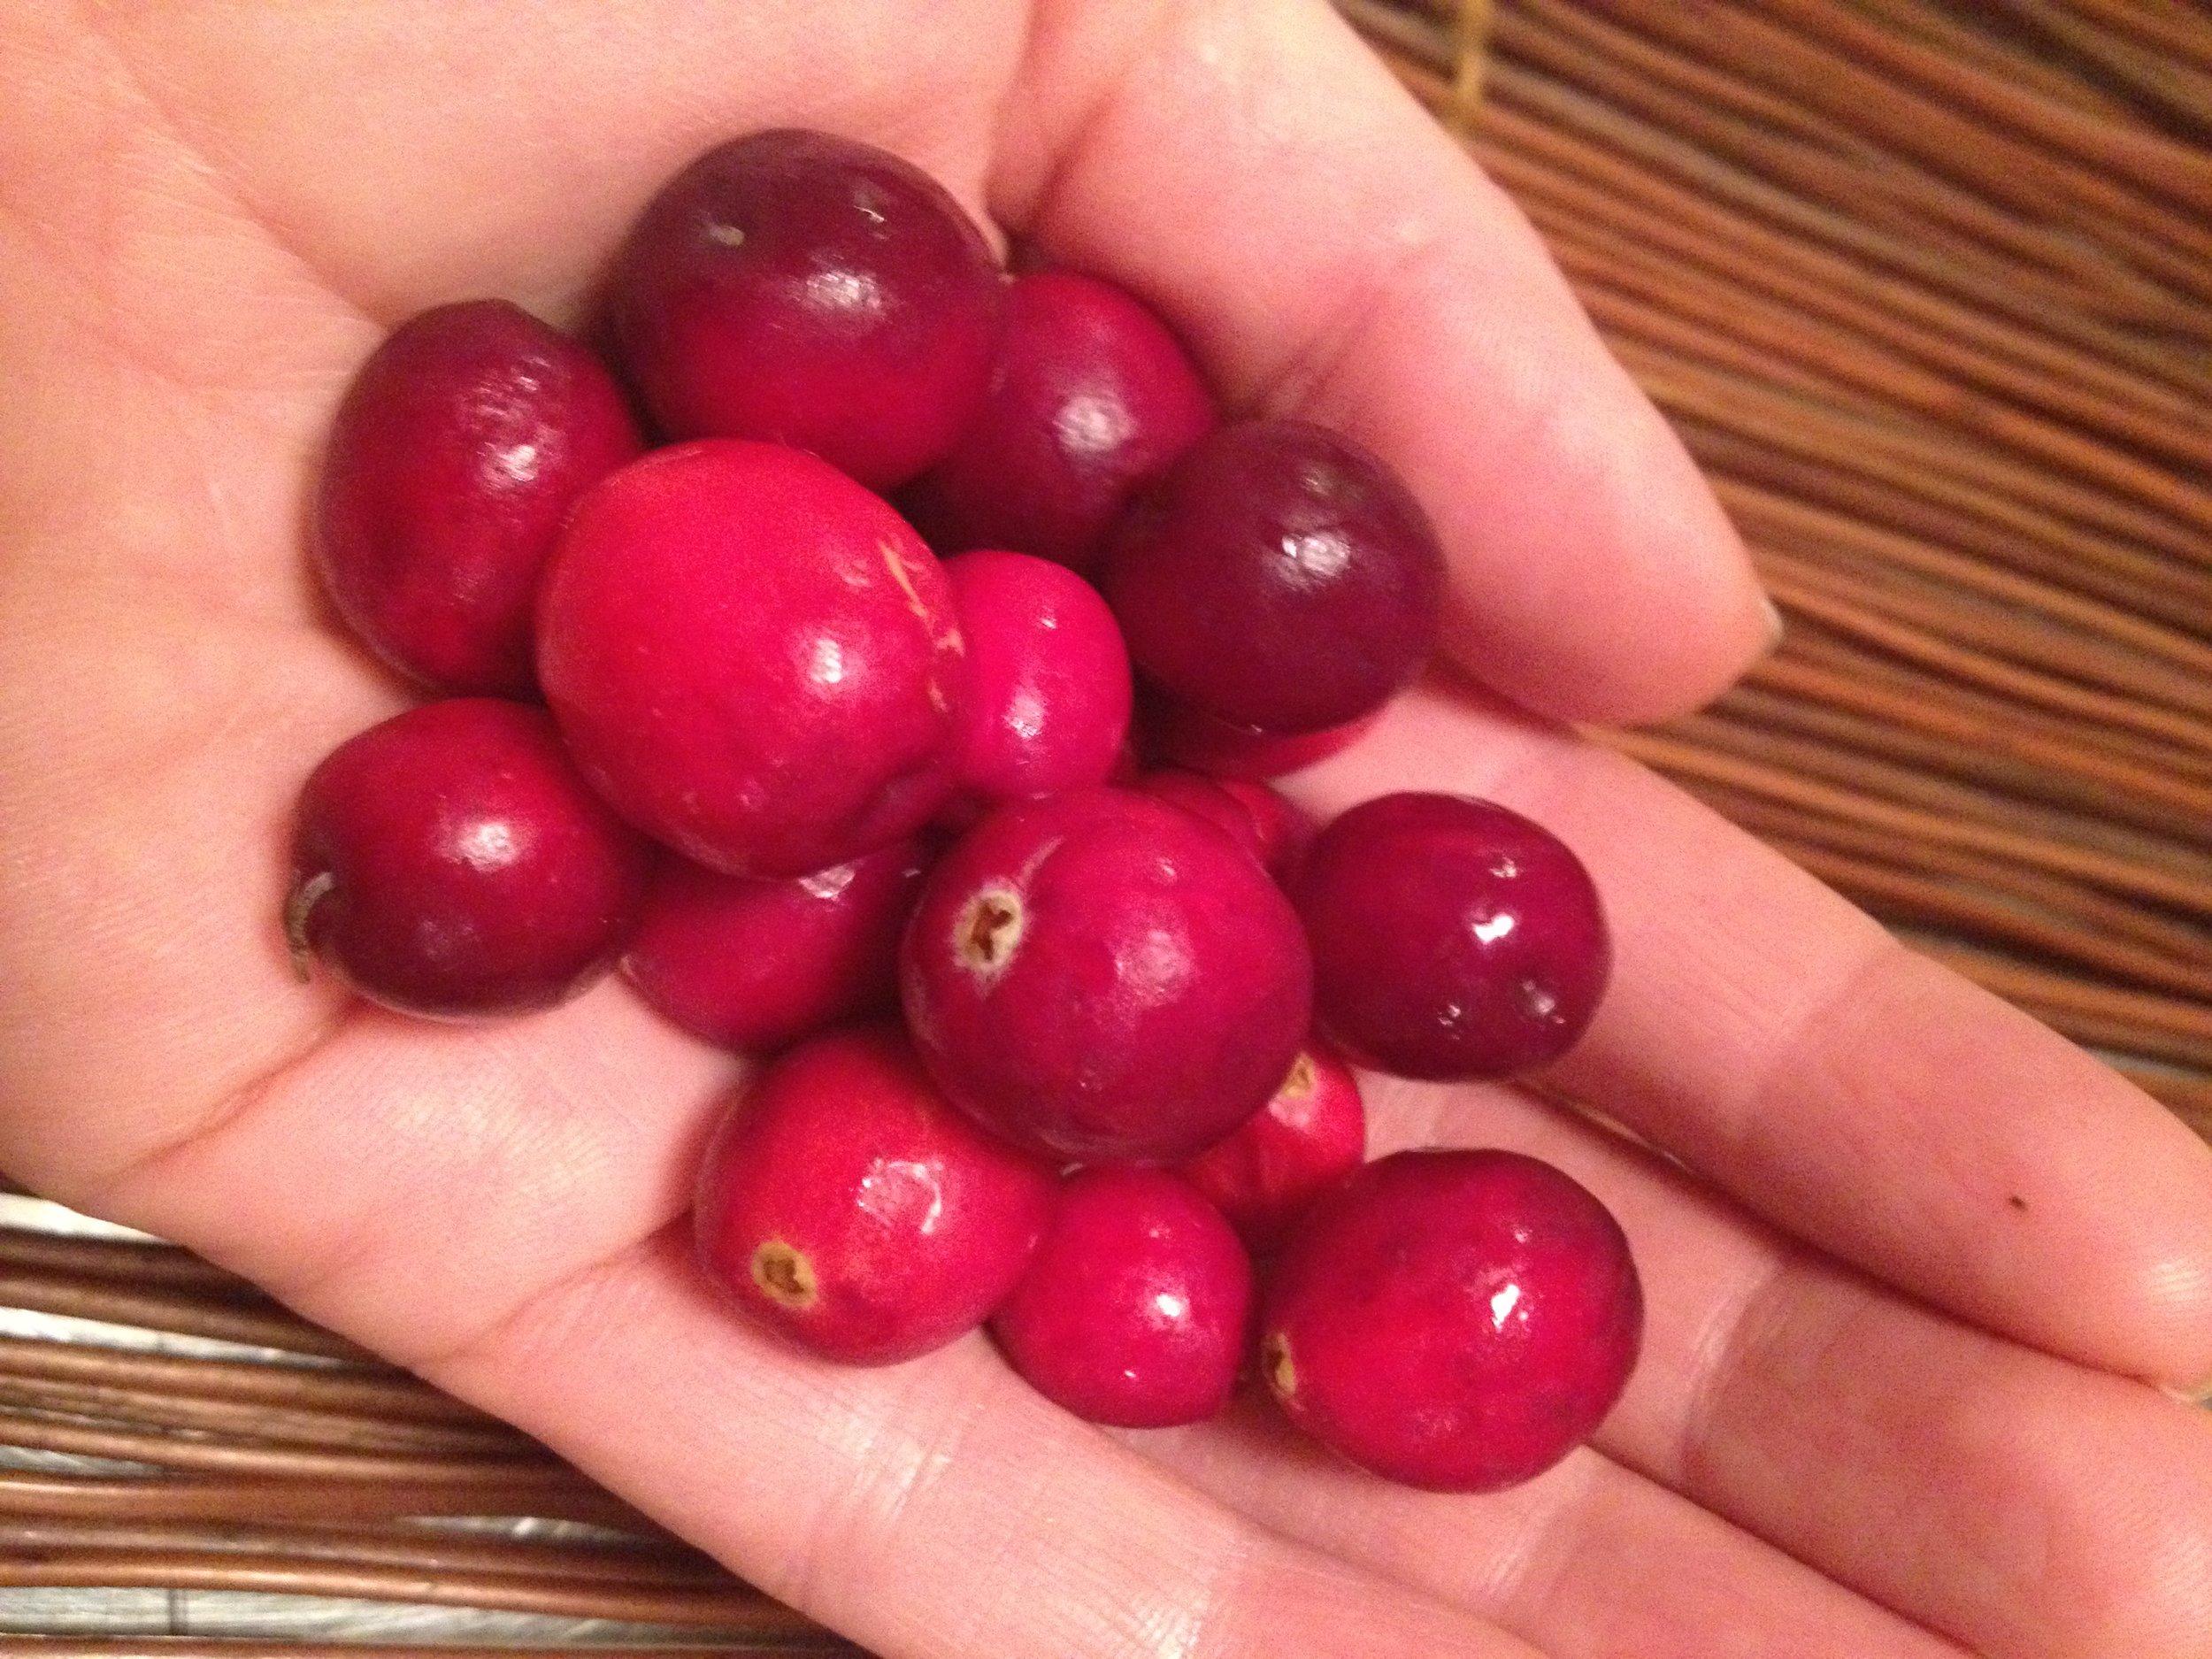 Fresh Organic Cranberries. I love the crimson hue they posses.